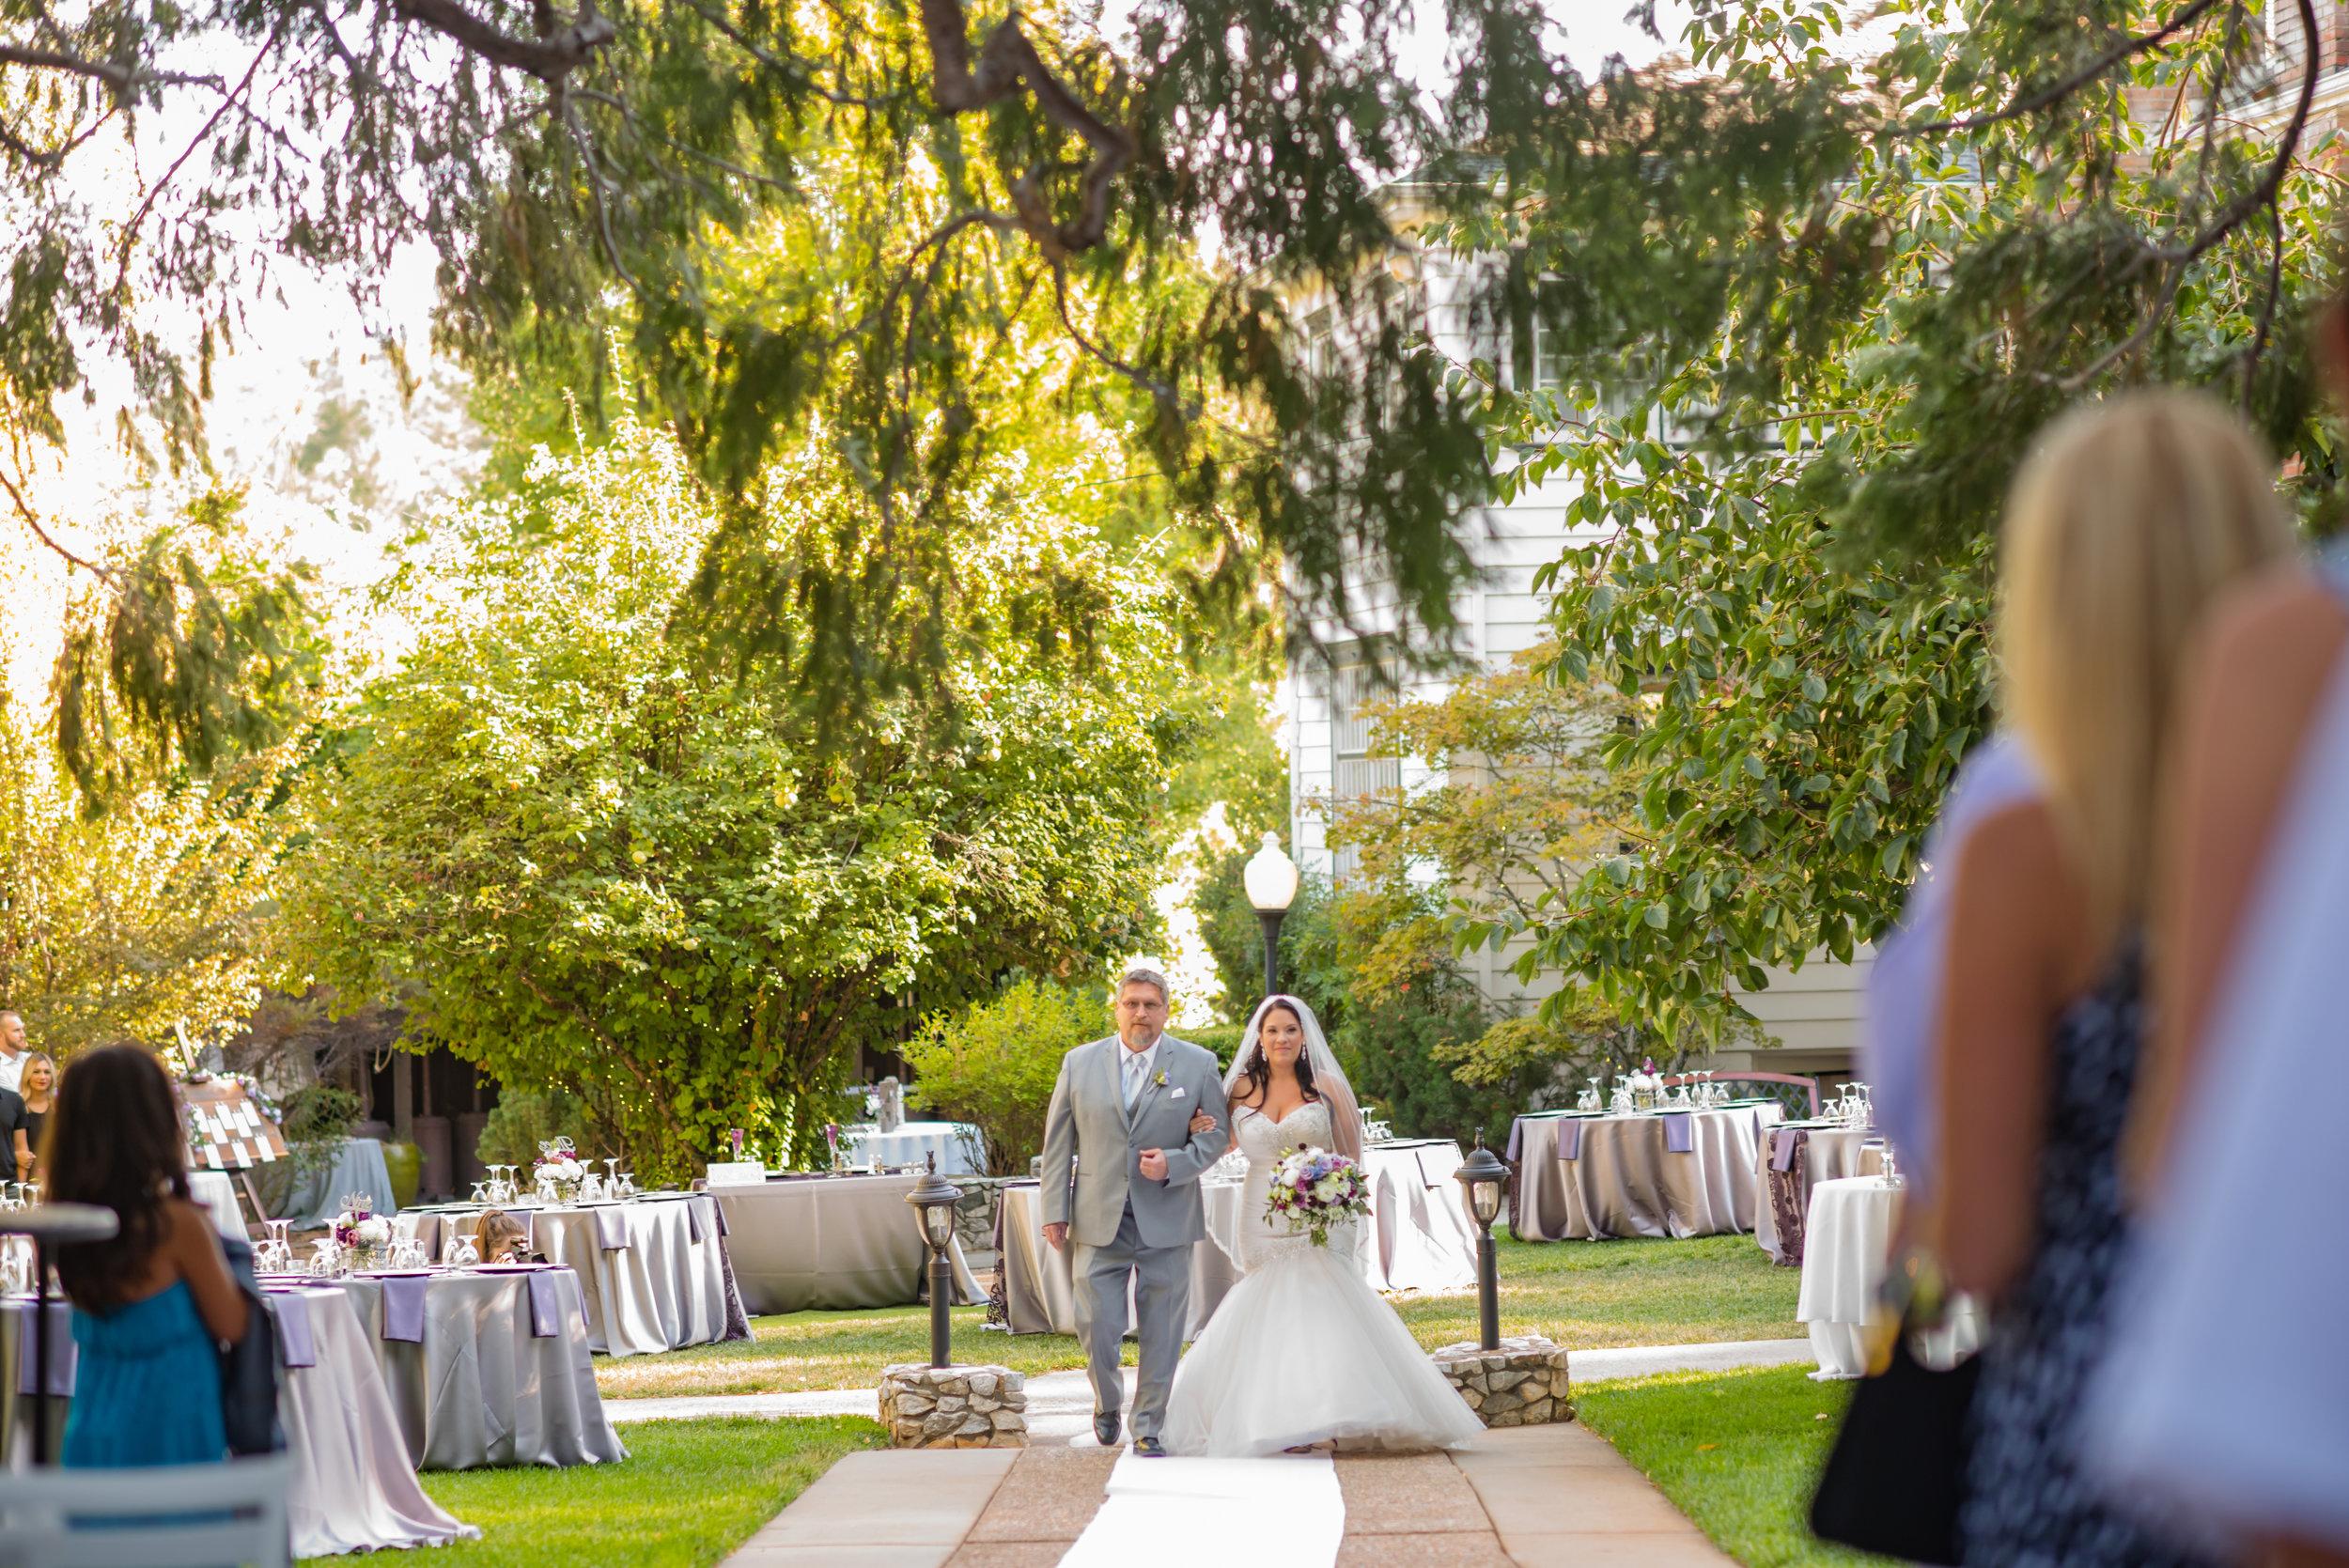 erika-seth-015-monte-verde-inn-sacramento-wedding-photographer-katherine-nicole-photography.JPG